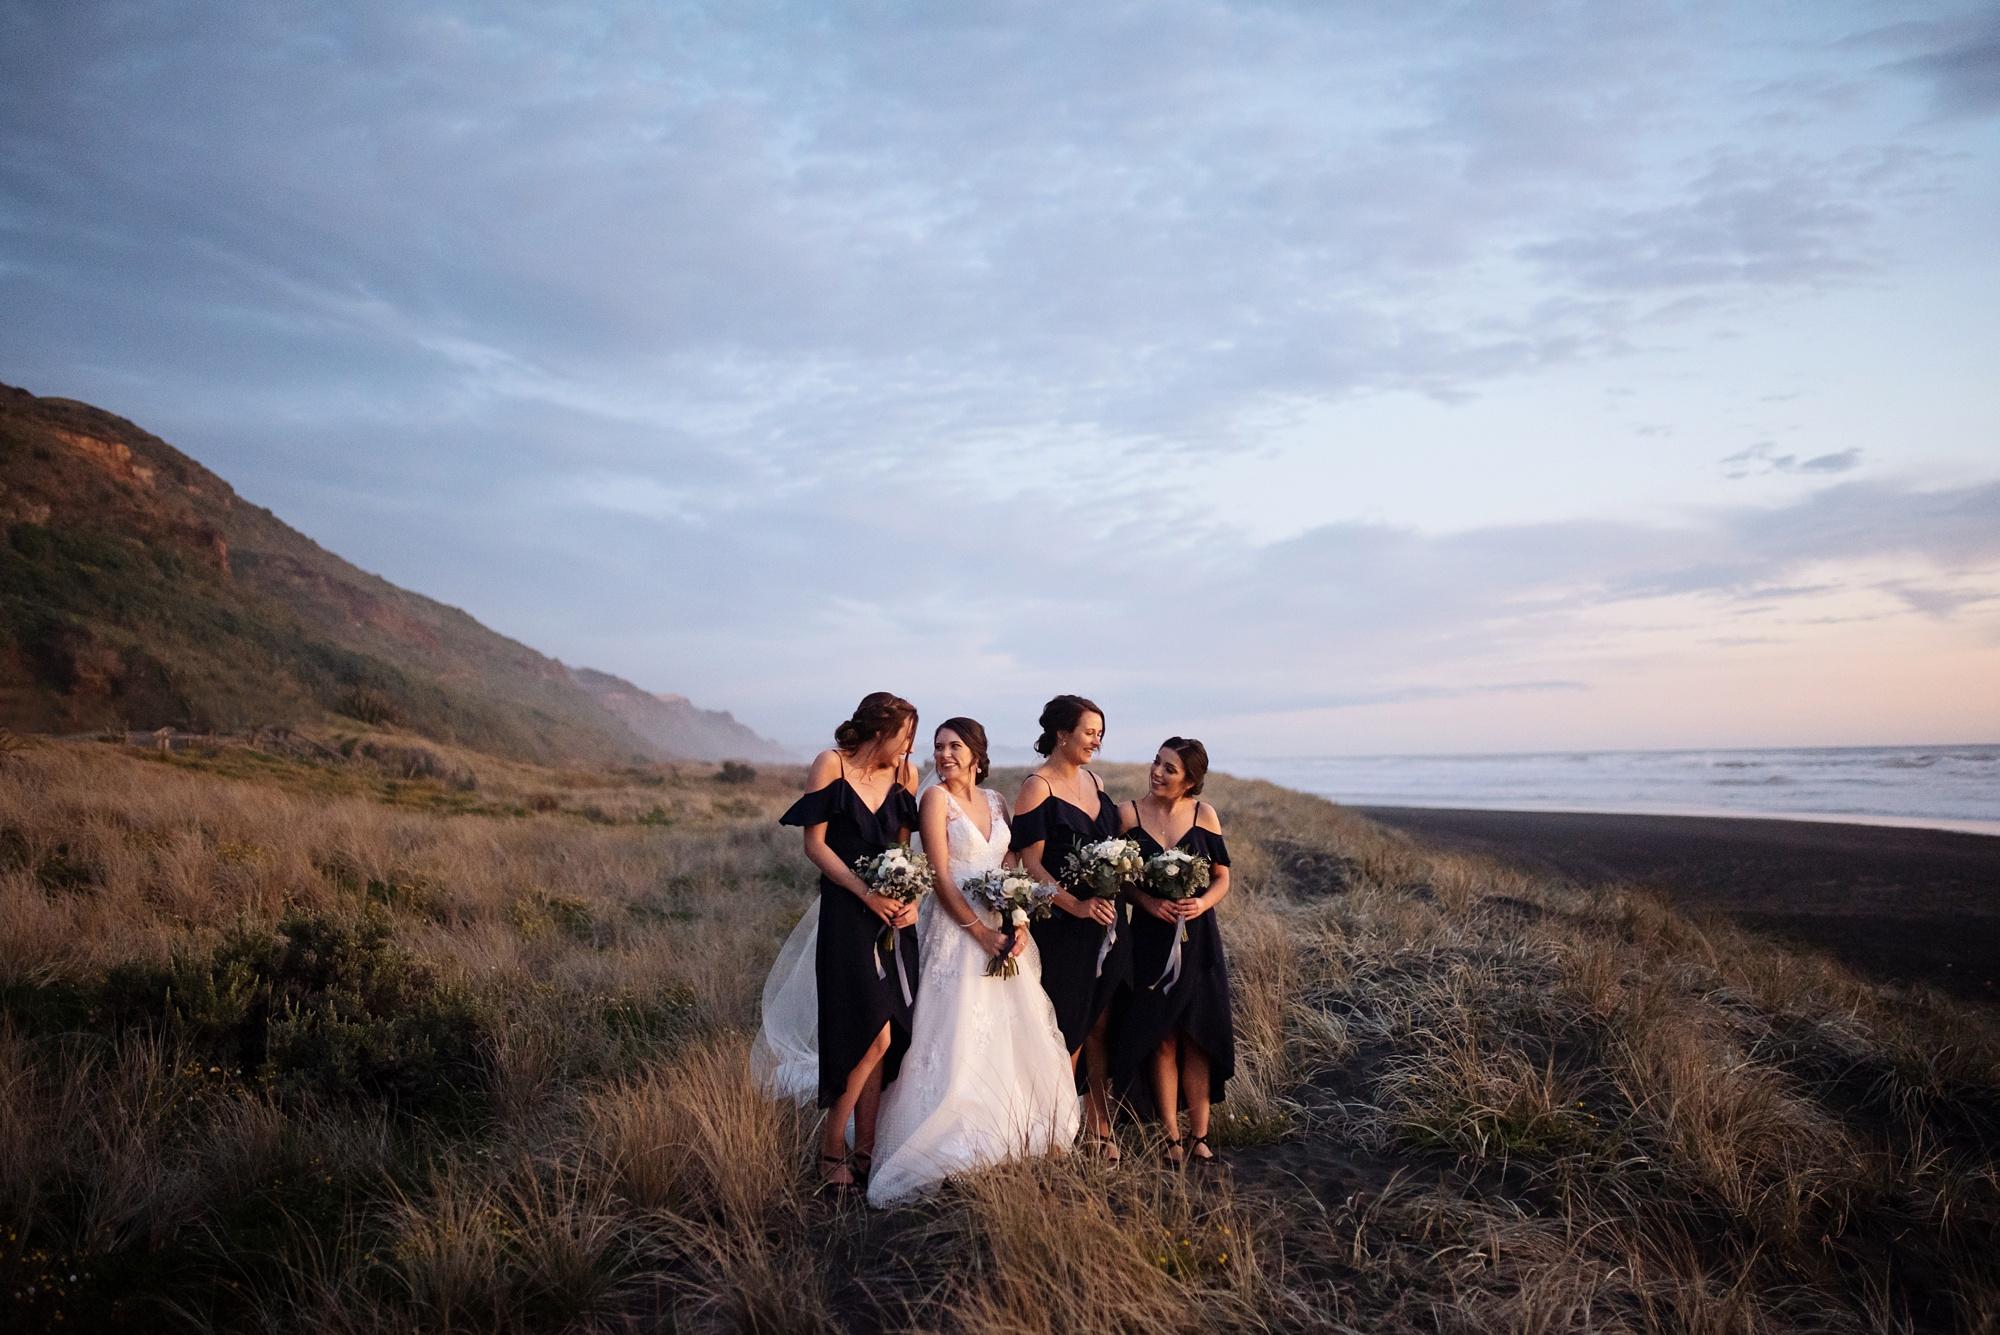 Amy Wolland - Michael & Lisa Married! -640.jpg